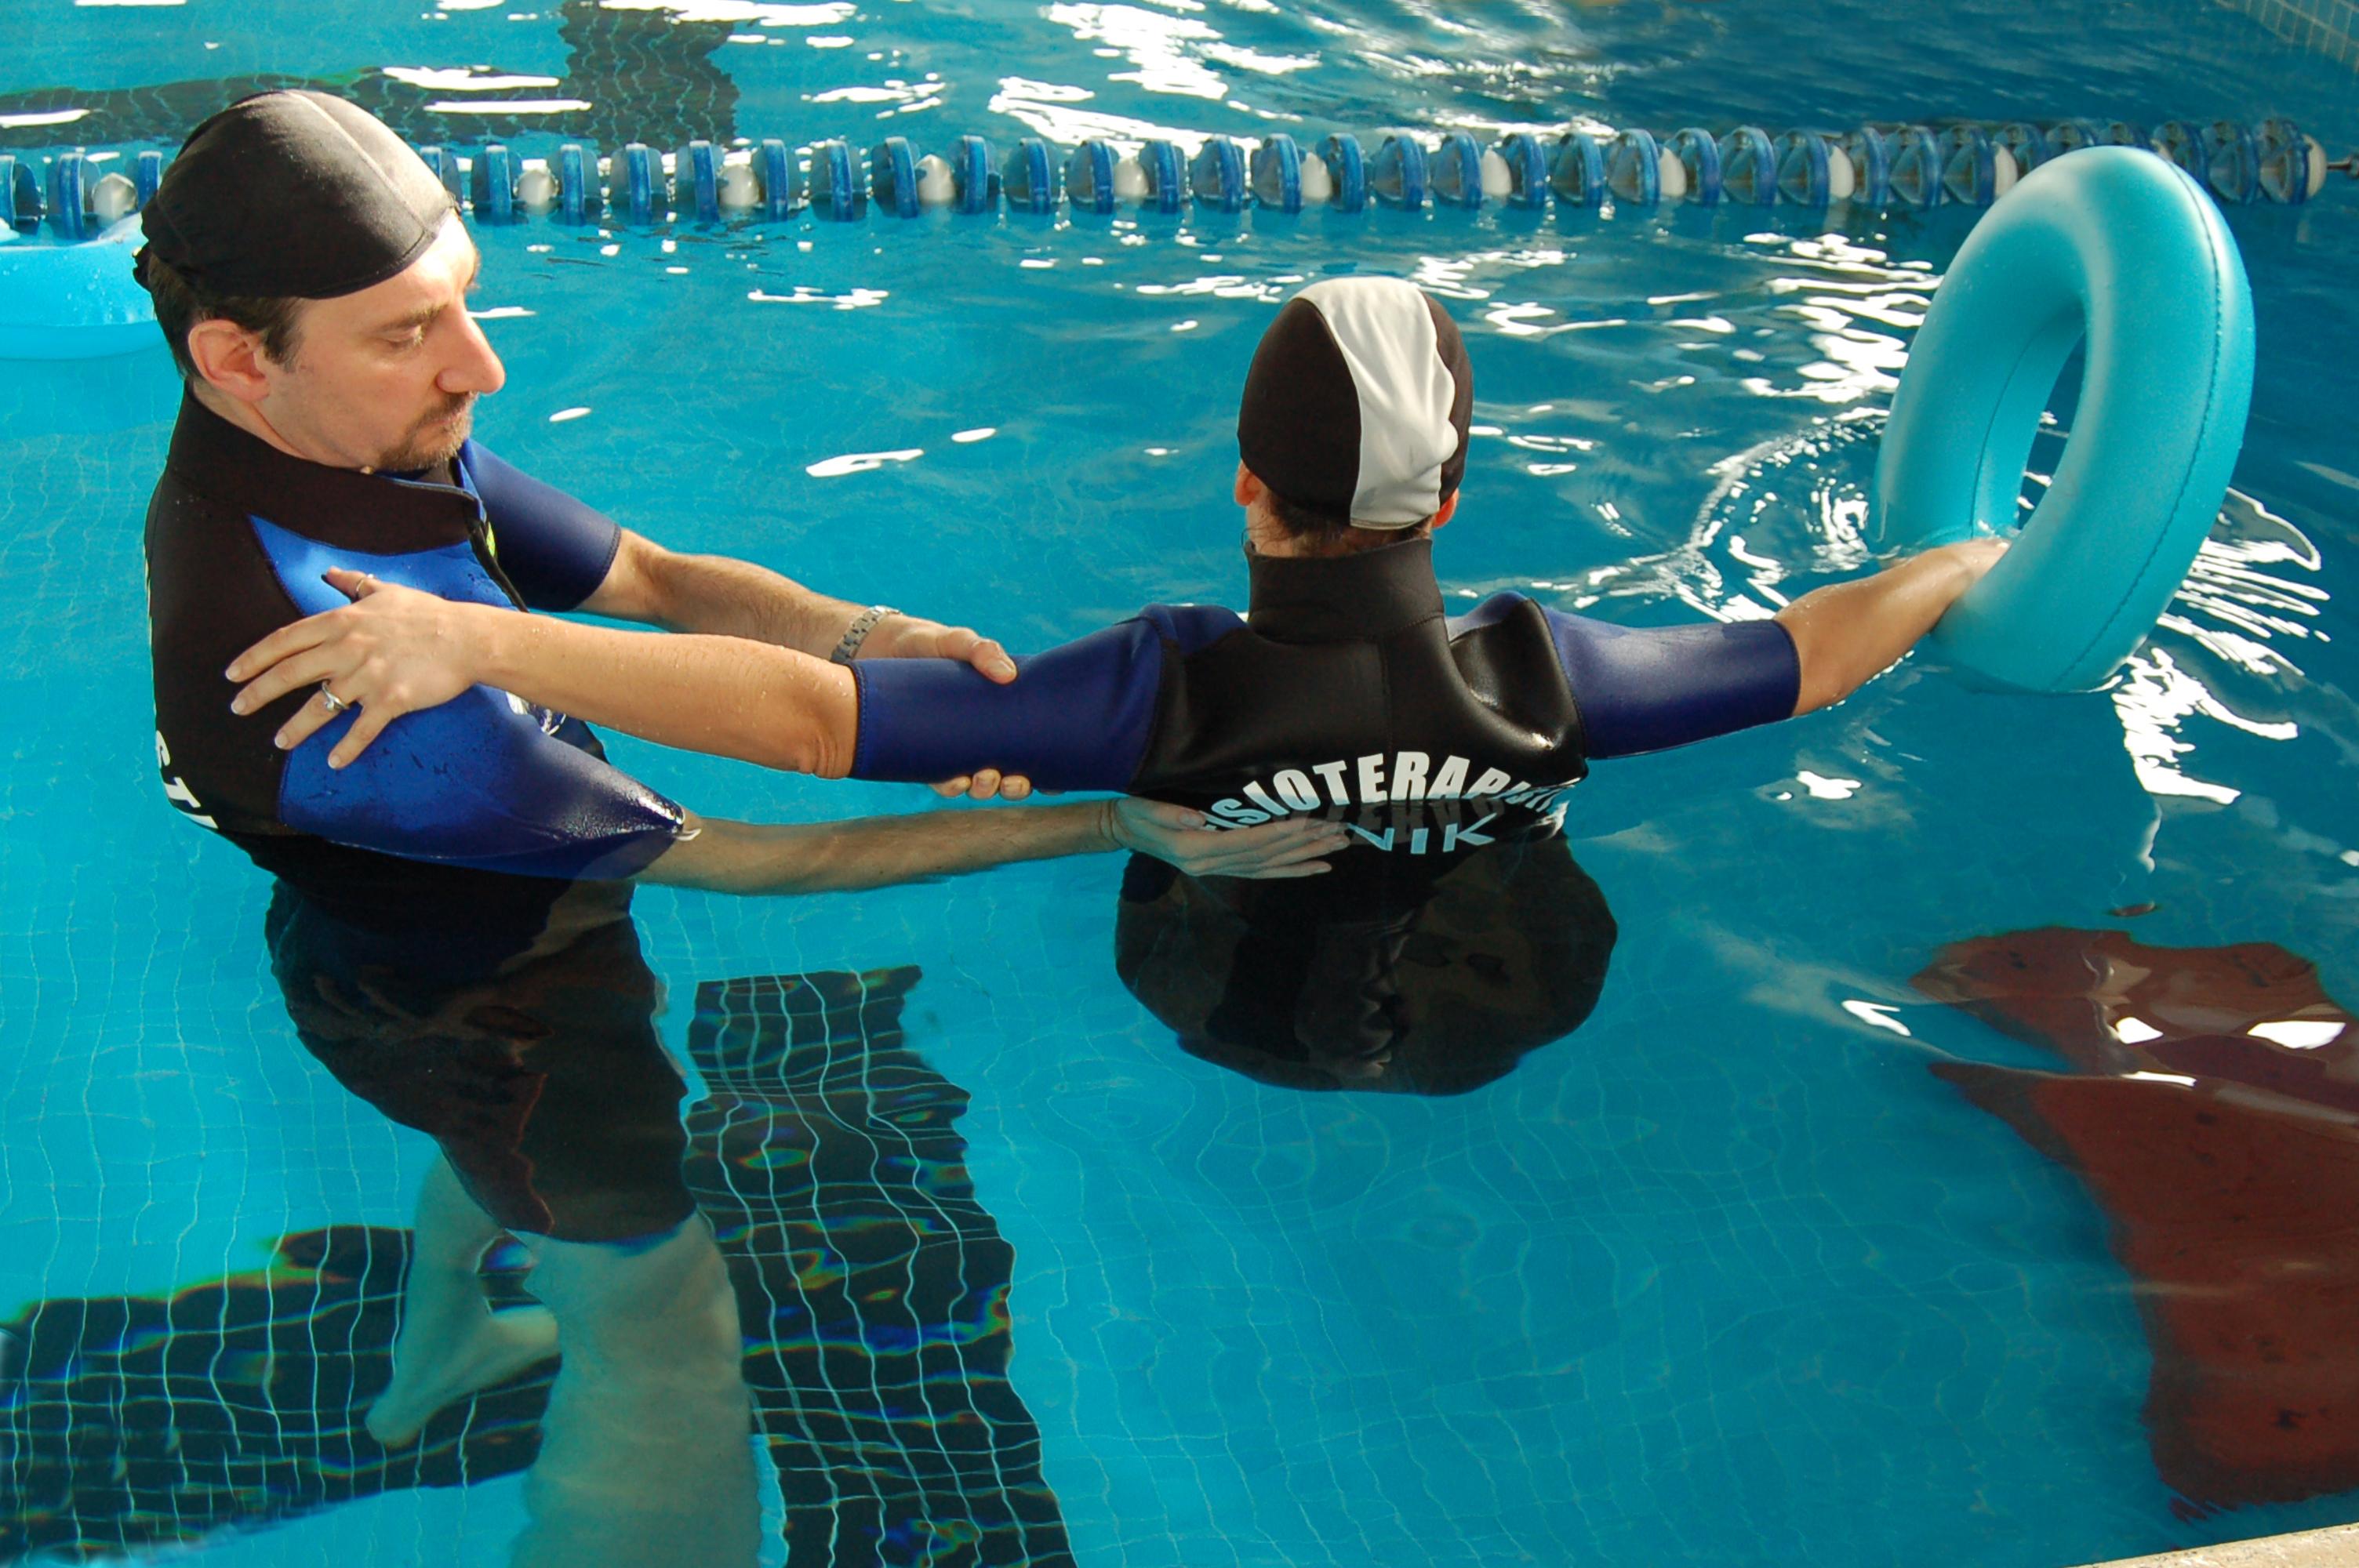 Idrokineisterapia riabilitazione in acqua